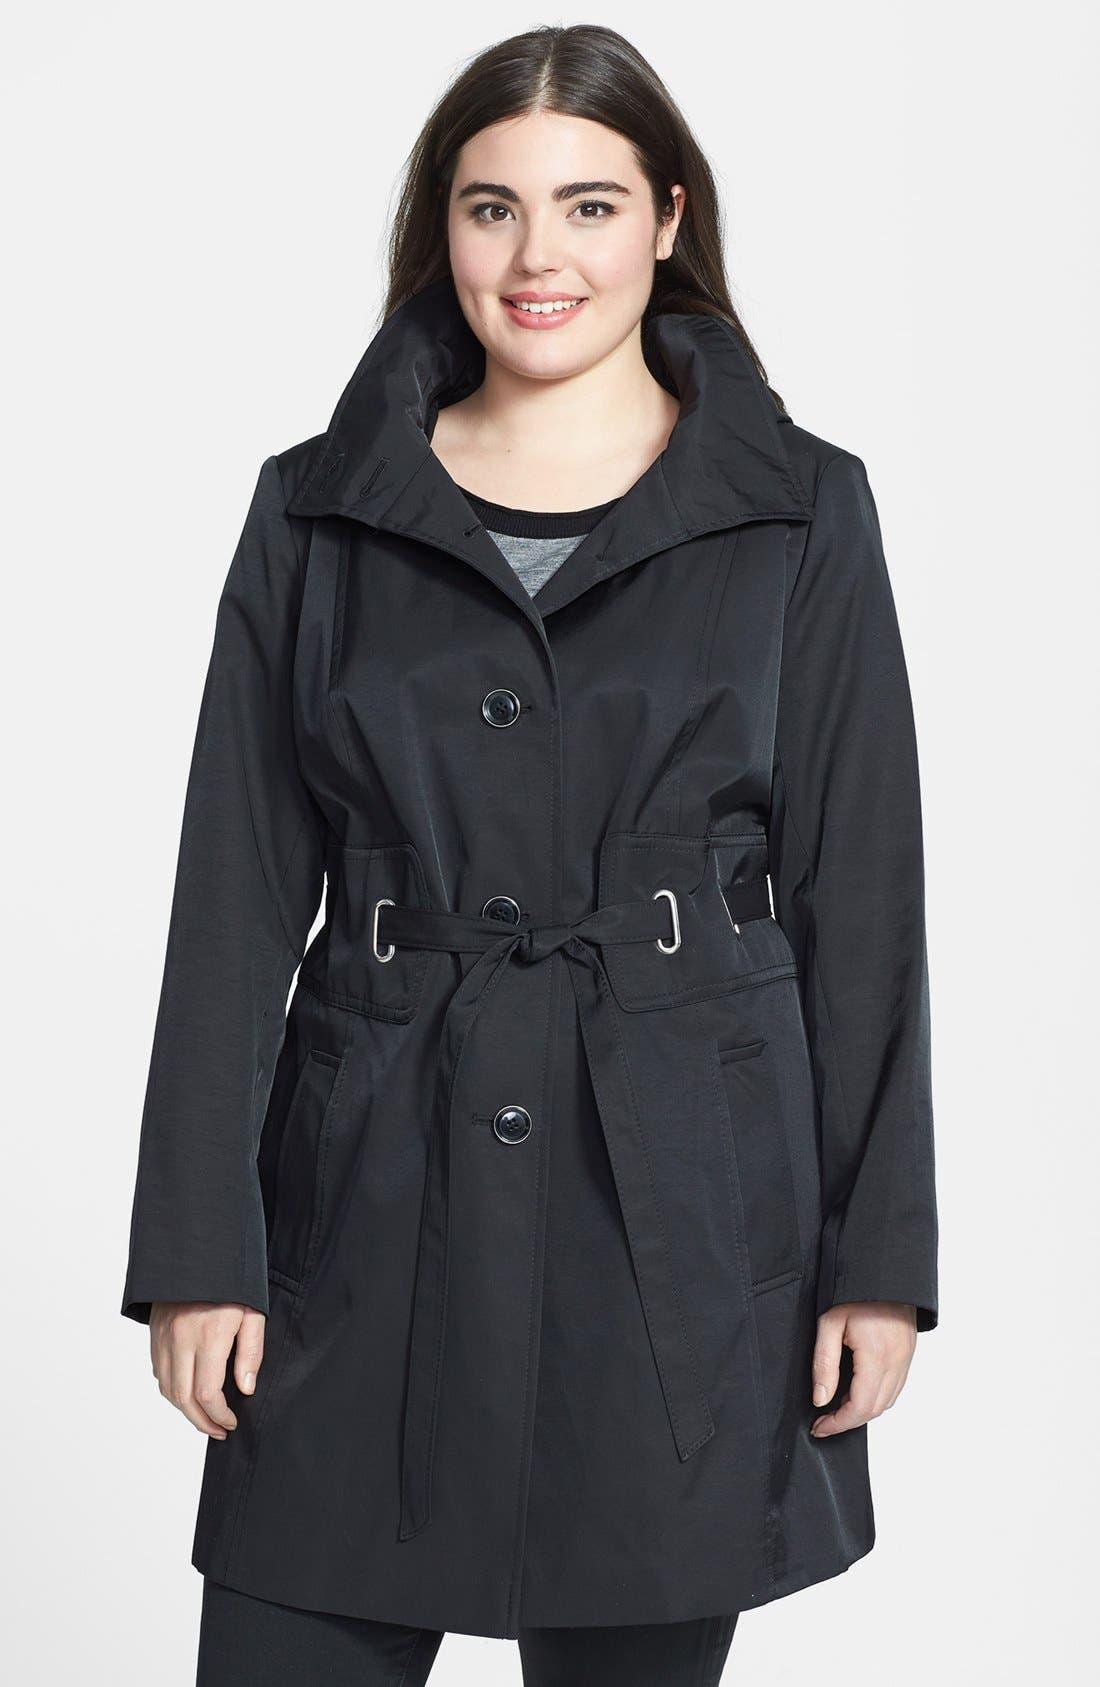 Main Image - Via Spiga Belted Hooded Raincoat (Plus Size)